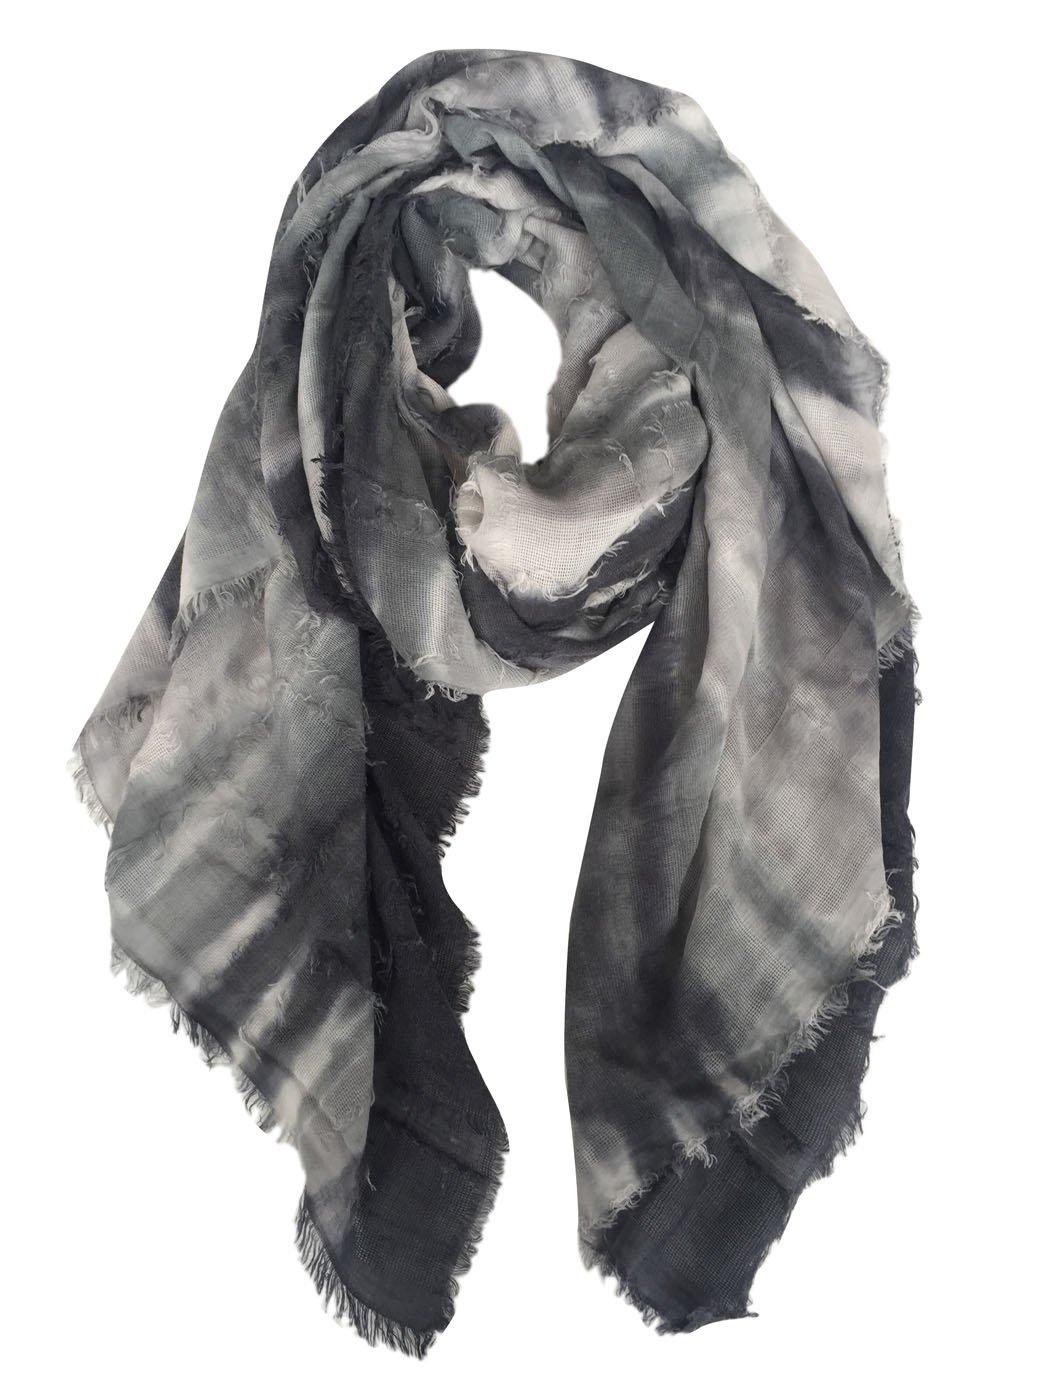 GERINLY Tie-Dye Men Scarves Lightweight Soft Cotton-Linen Scarf (Black Gray) 94c-e9b21de